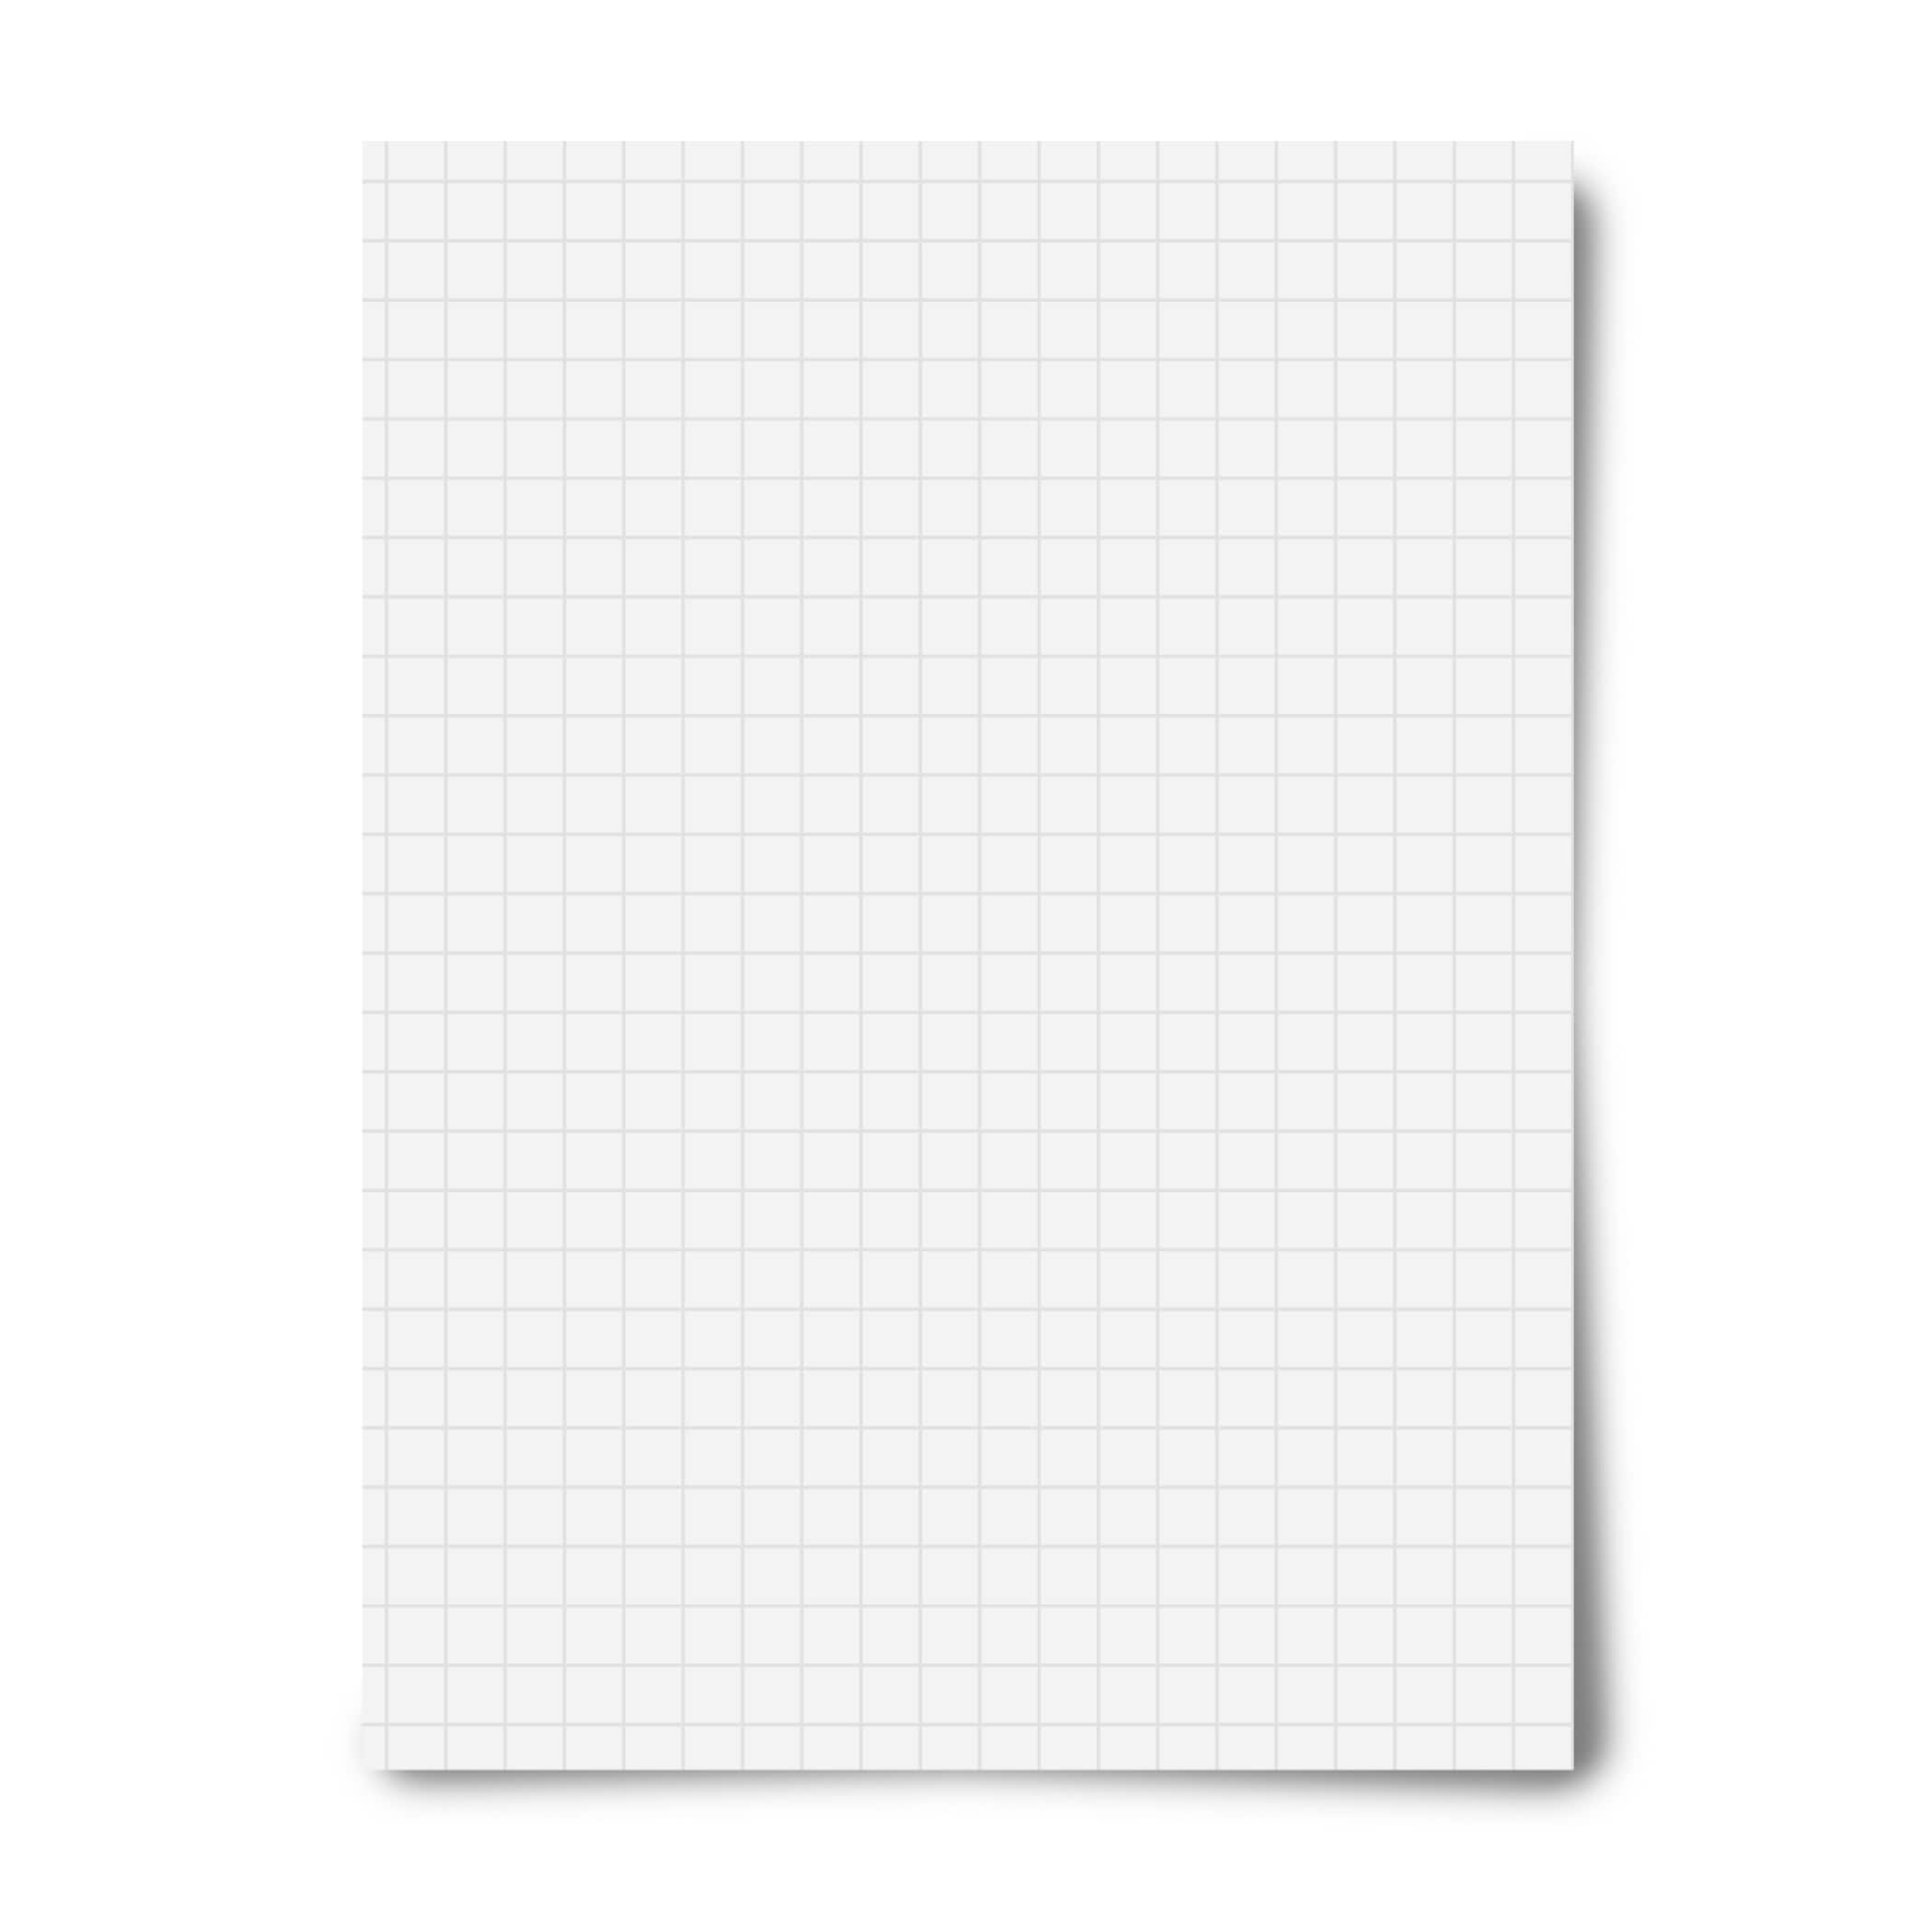 royal brites white grid heavyweight poster board